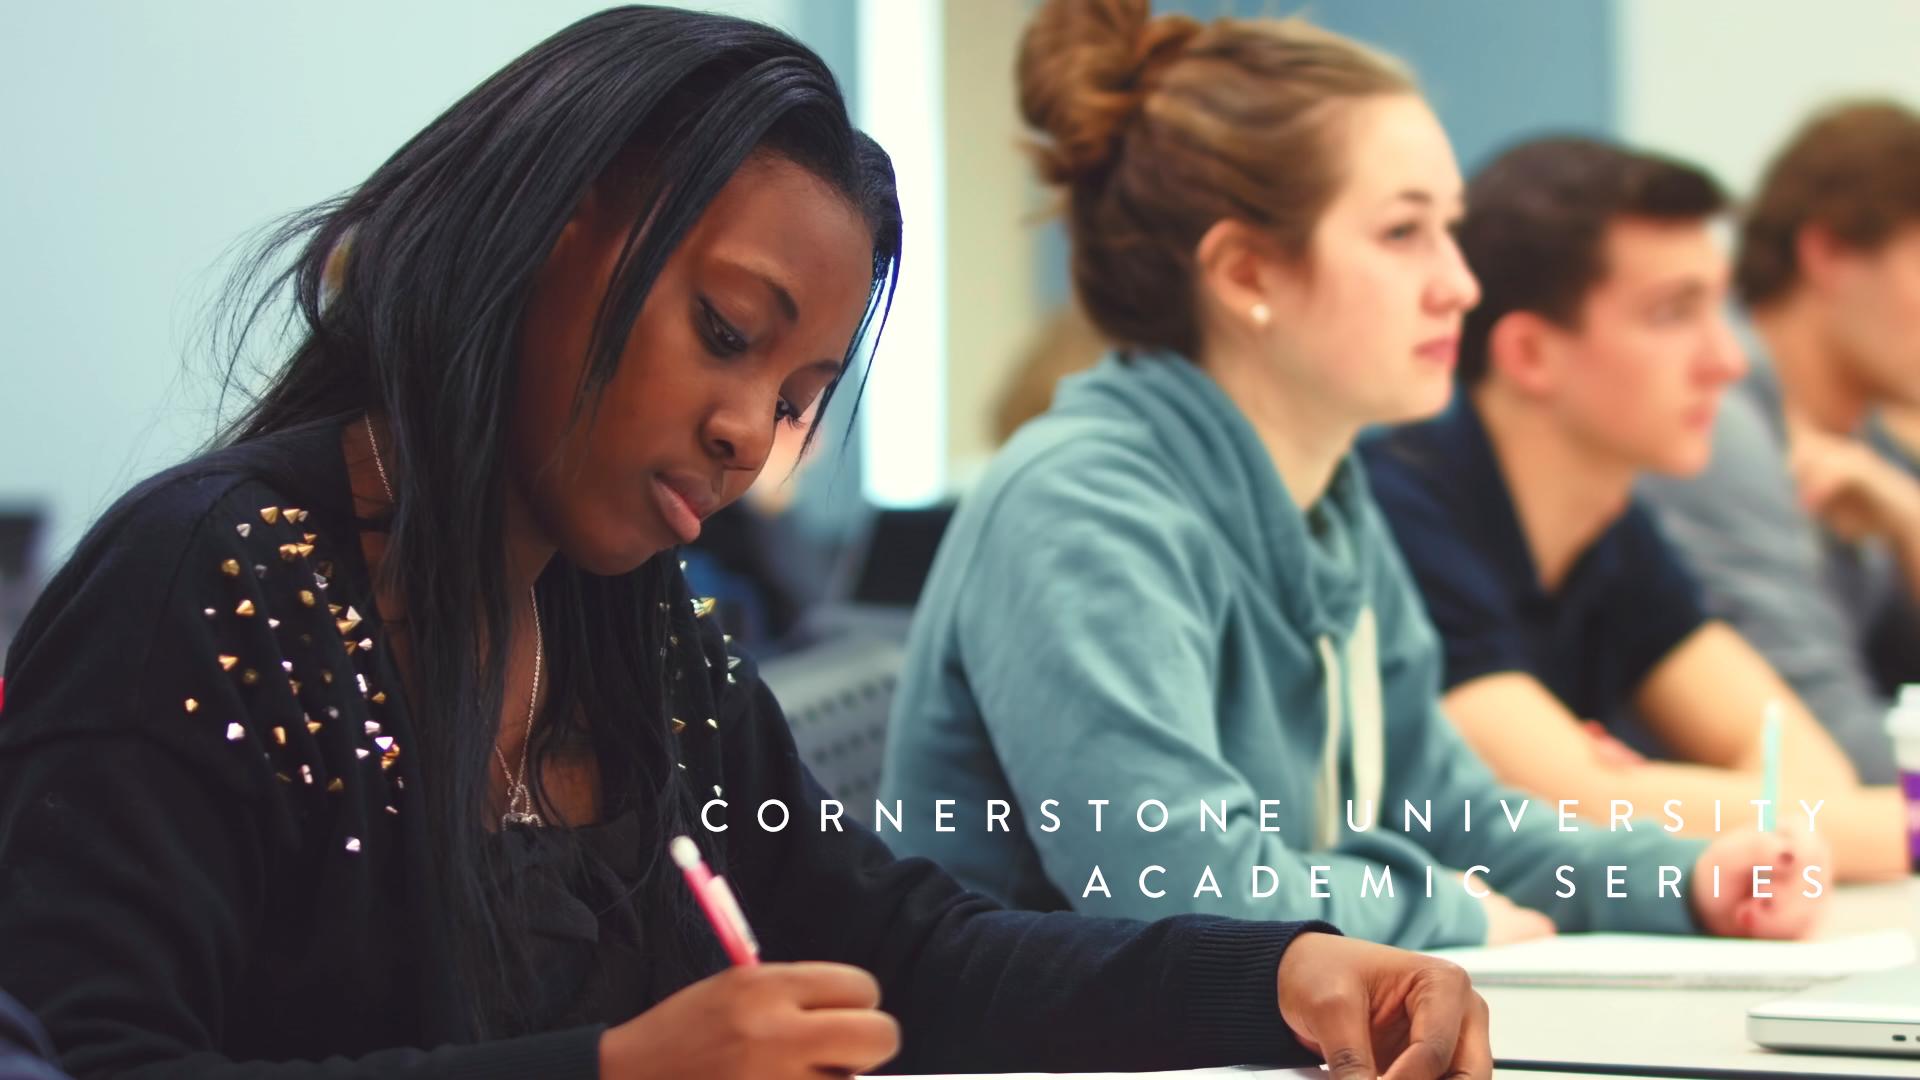 Cornerstone-University-Grand-Rapids-Academic-Commercial-Film-Series